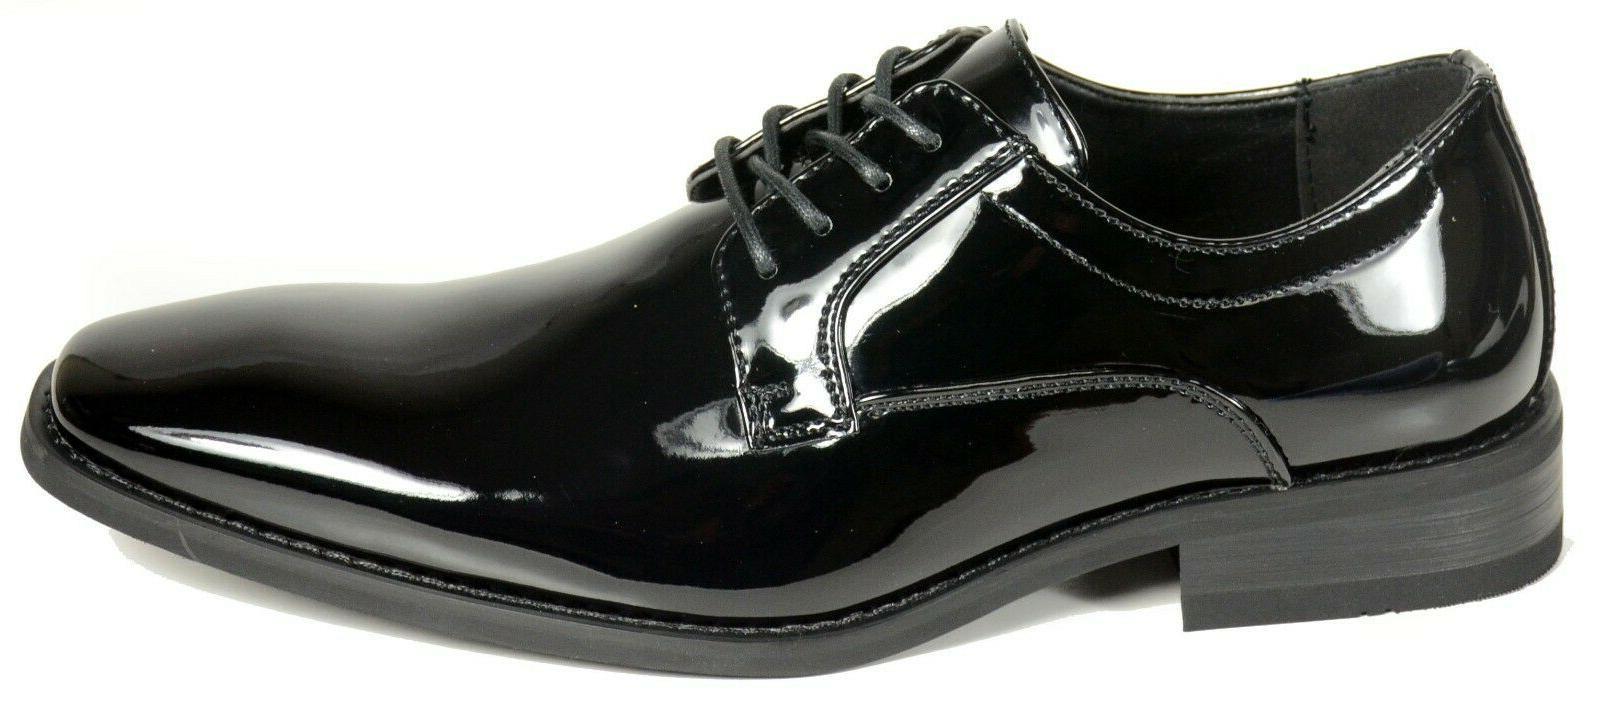 Men's wedding, tuxedo black patent leather formal dress shoe